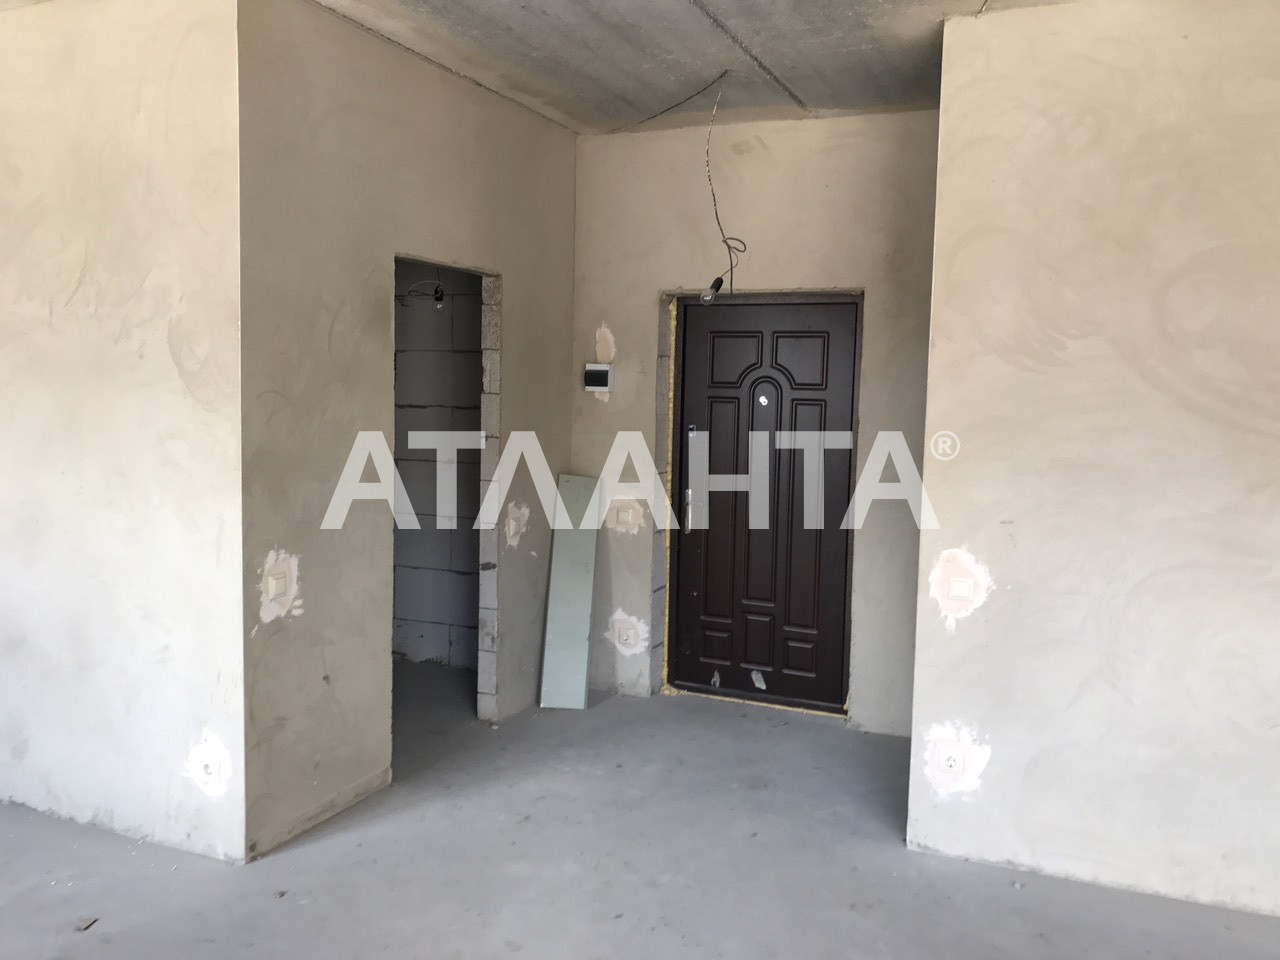 Продается 3-комнатная Квартира на ул. Валовня — 49 000 у.е. (фото №2)